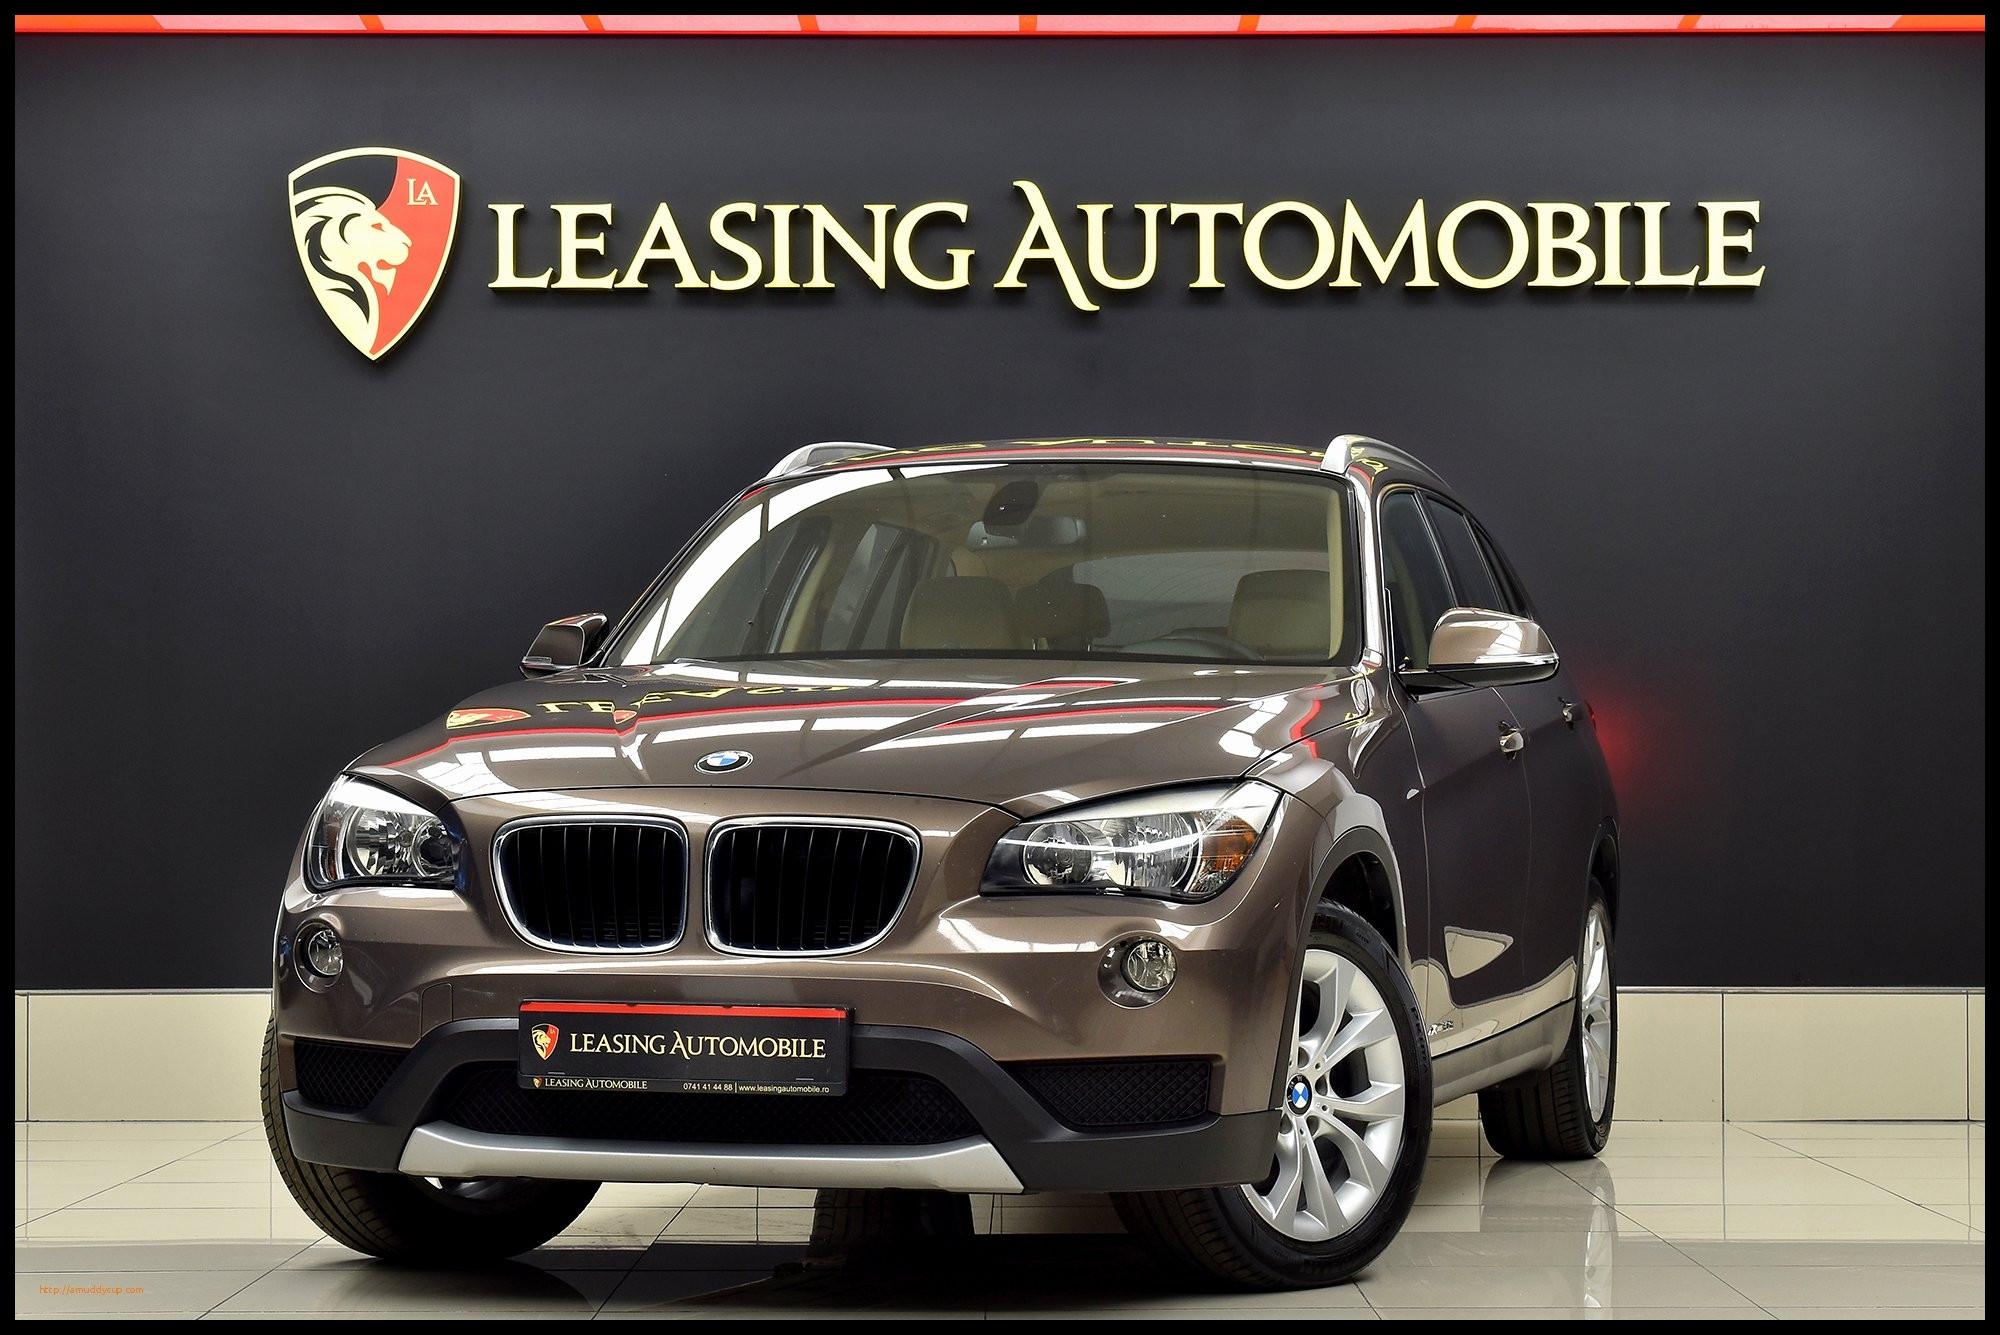 Bmw Los Angeles Lease Luxury Bmw Los Angeles Best Lease Bmw X1 Beautiful Auto Rulate Bmw